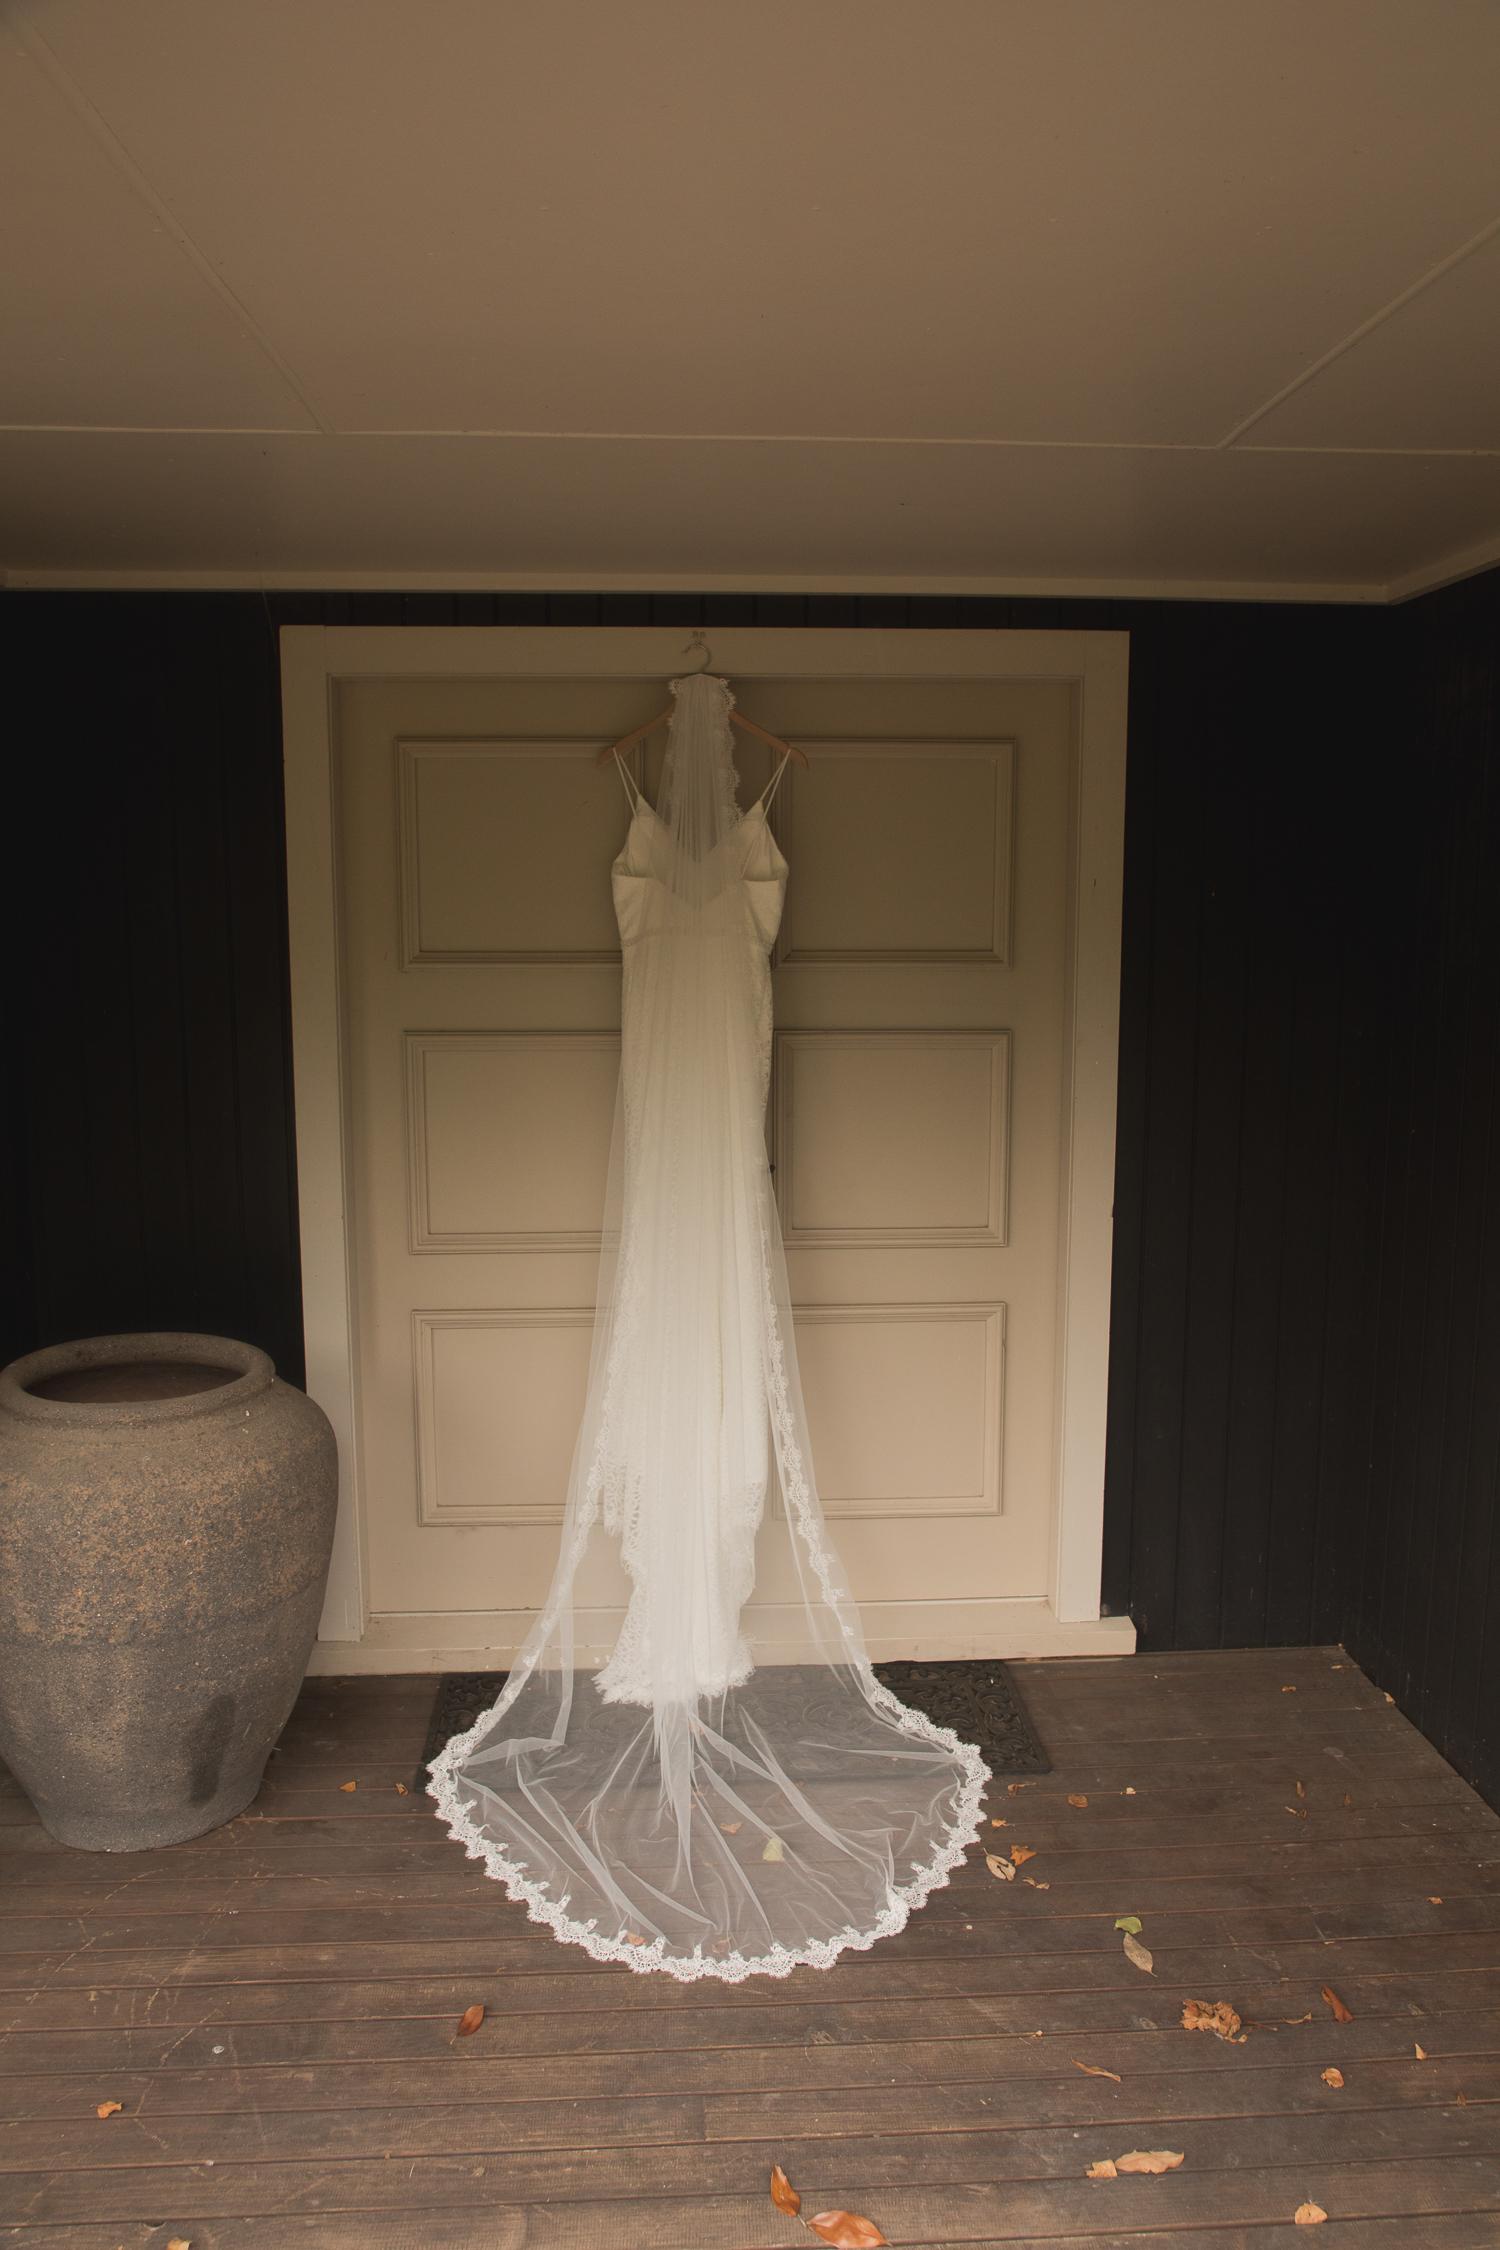 brides dress with veil